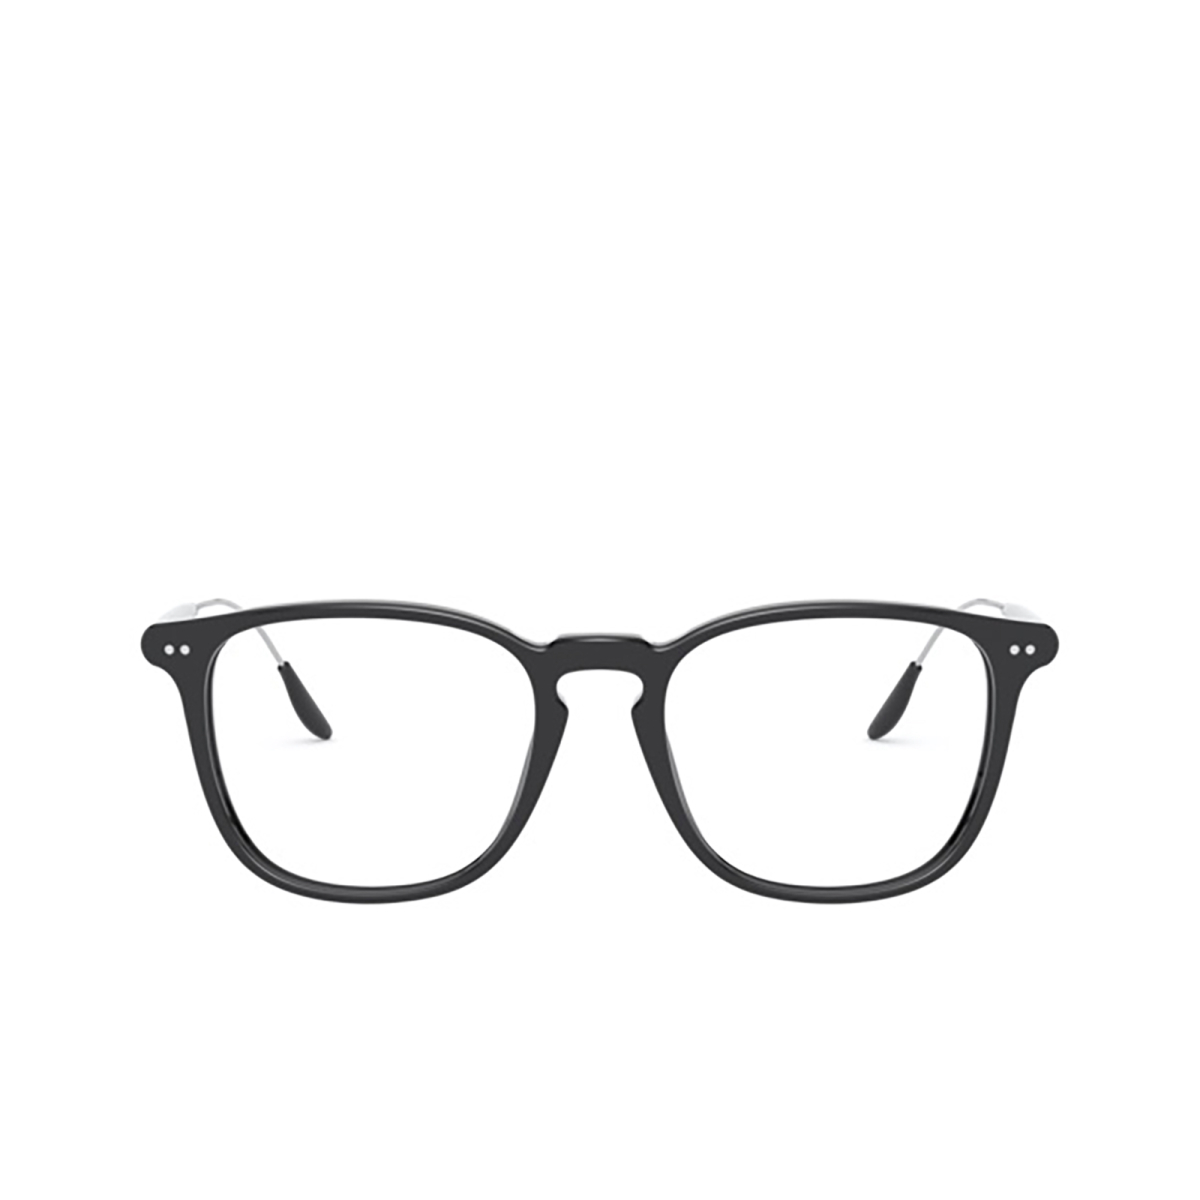 Ralph Lauren® Square Eyeglasses: RL6196P color Shiny Black 5001.